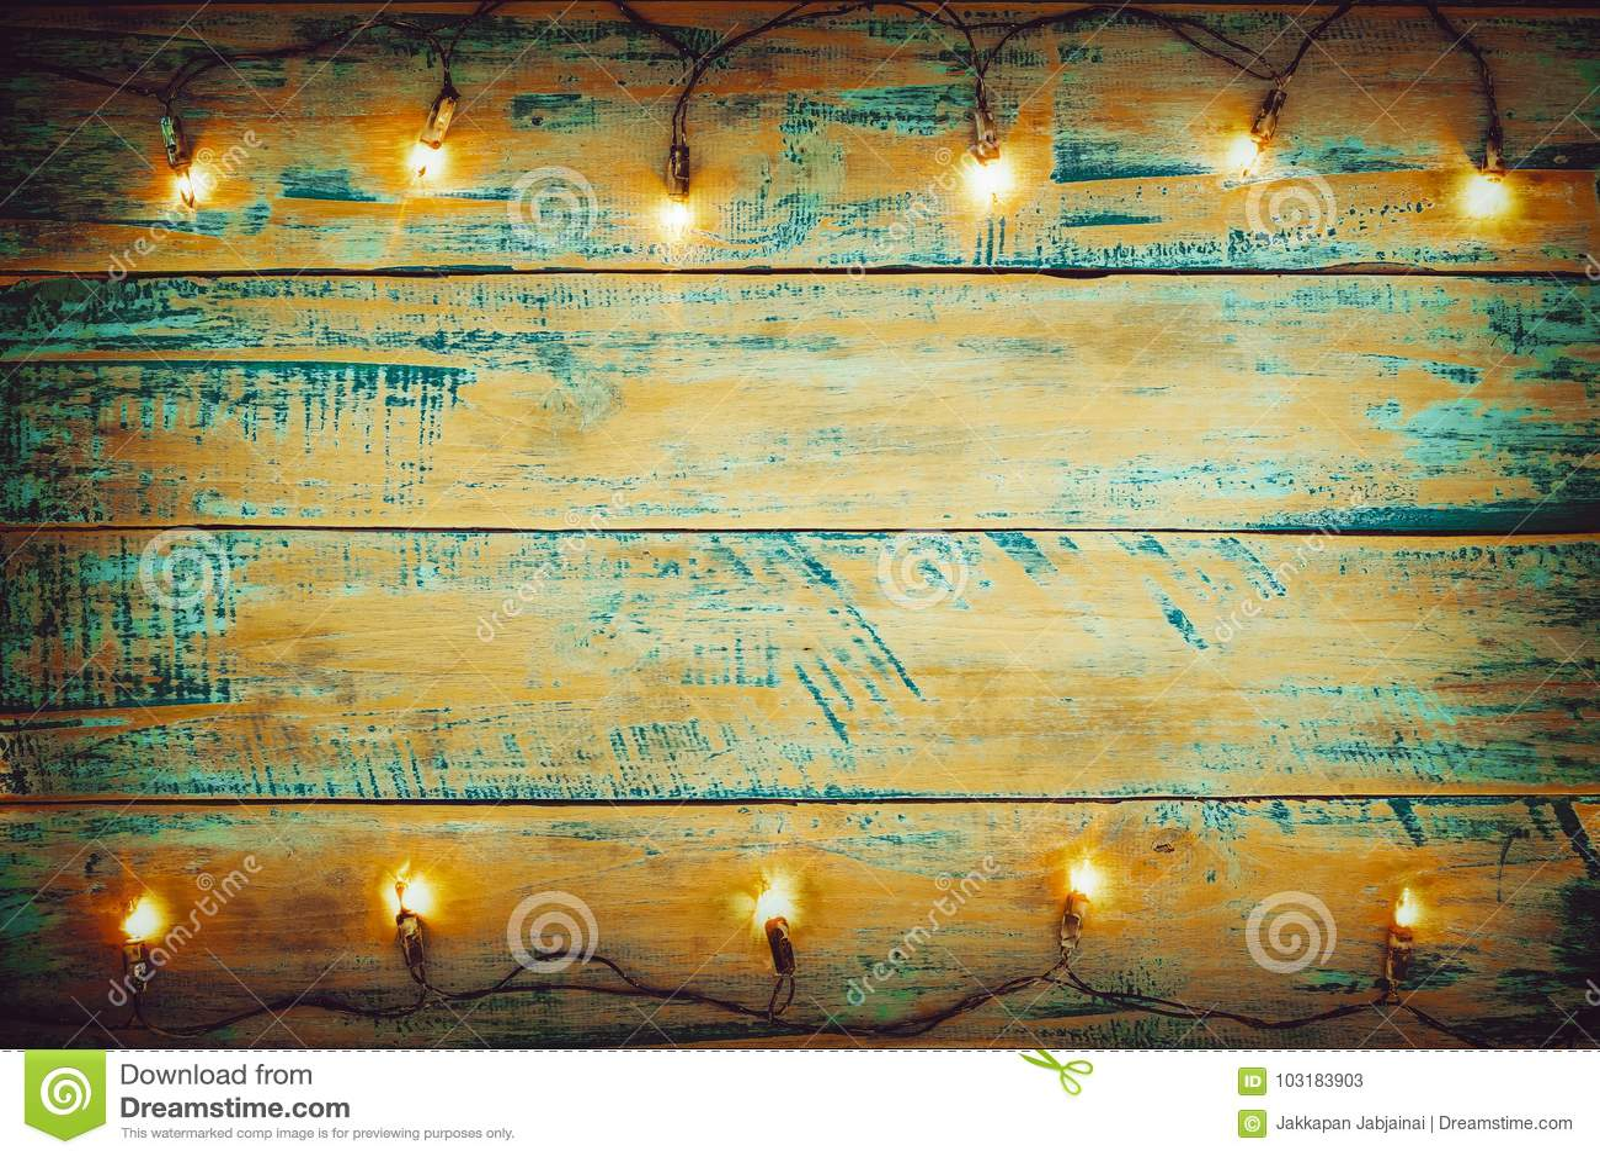 Christmas lights bulb on wood table. Merry christmas xmas background